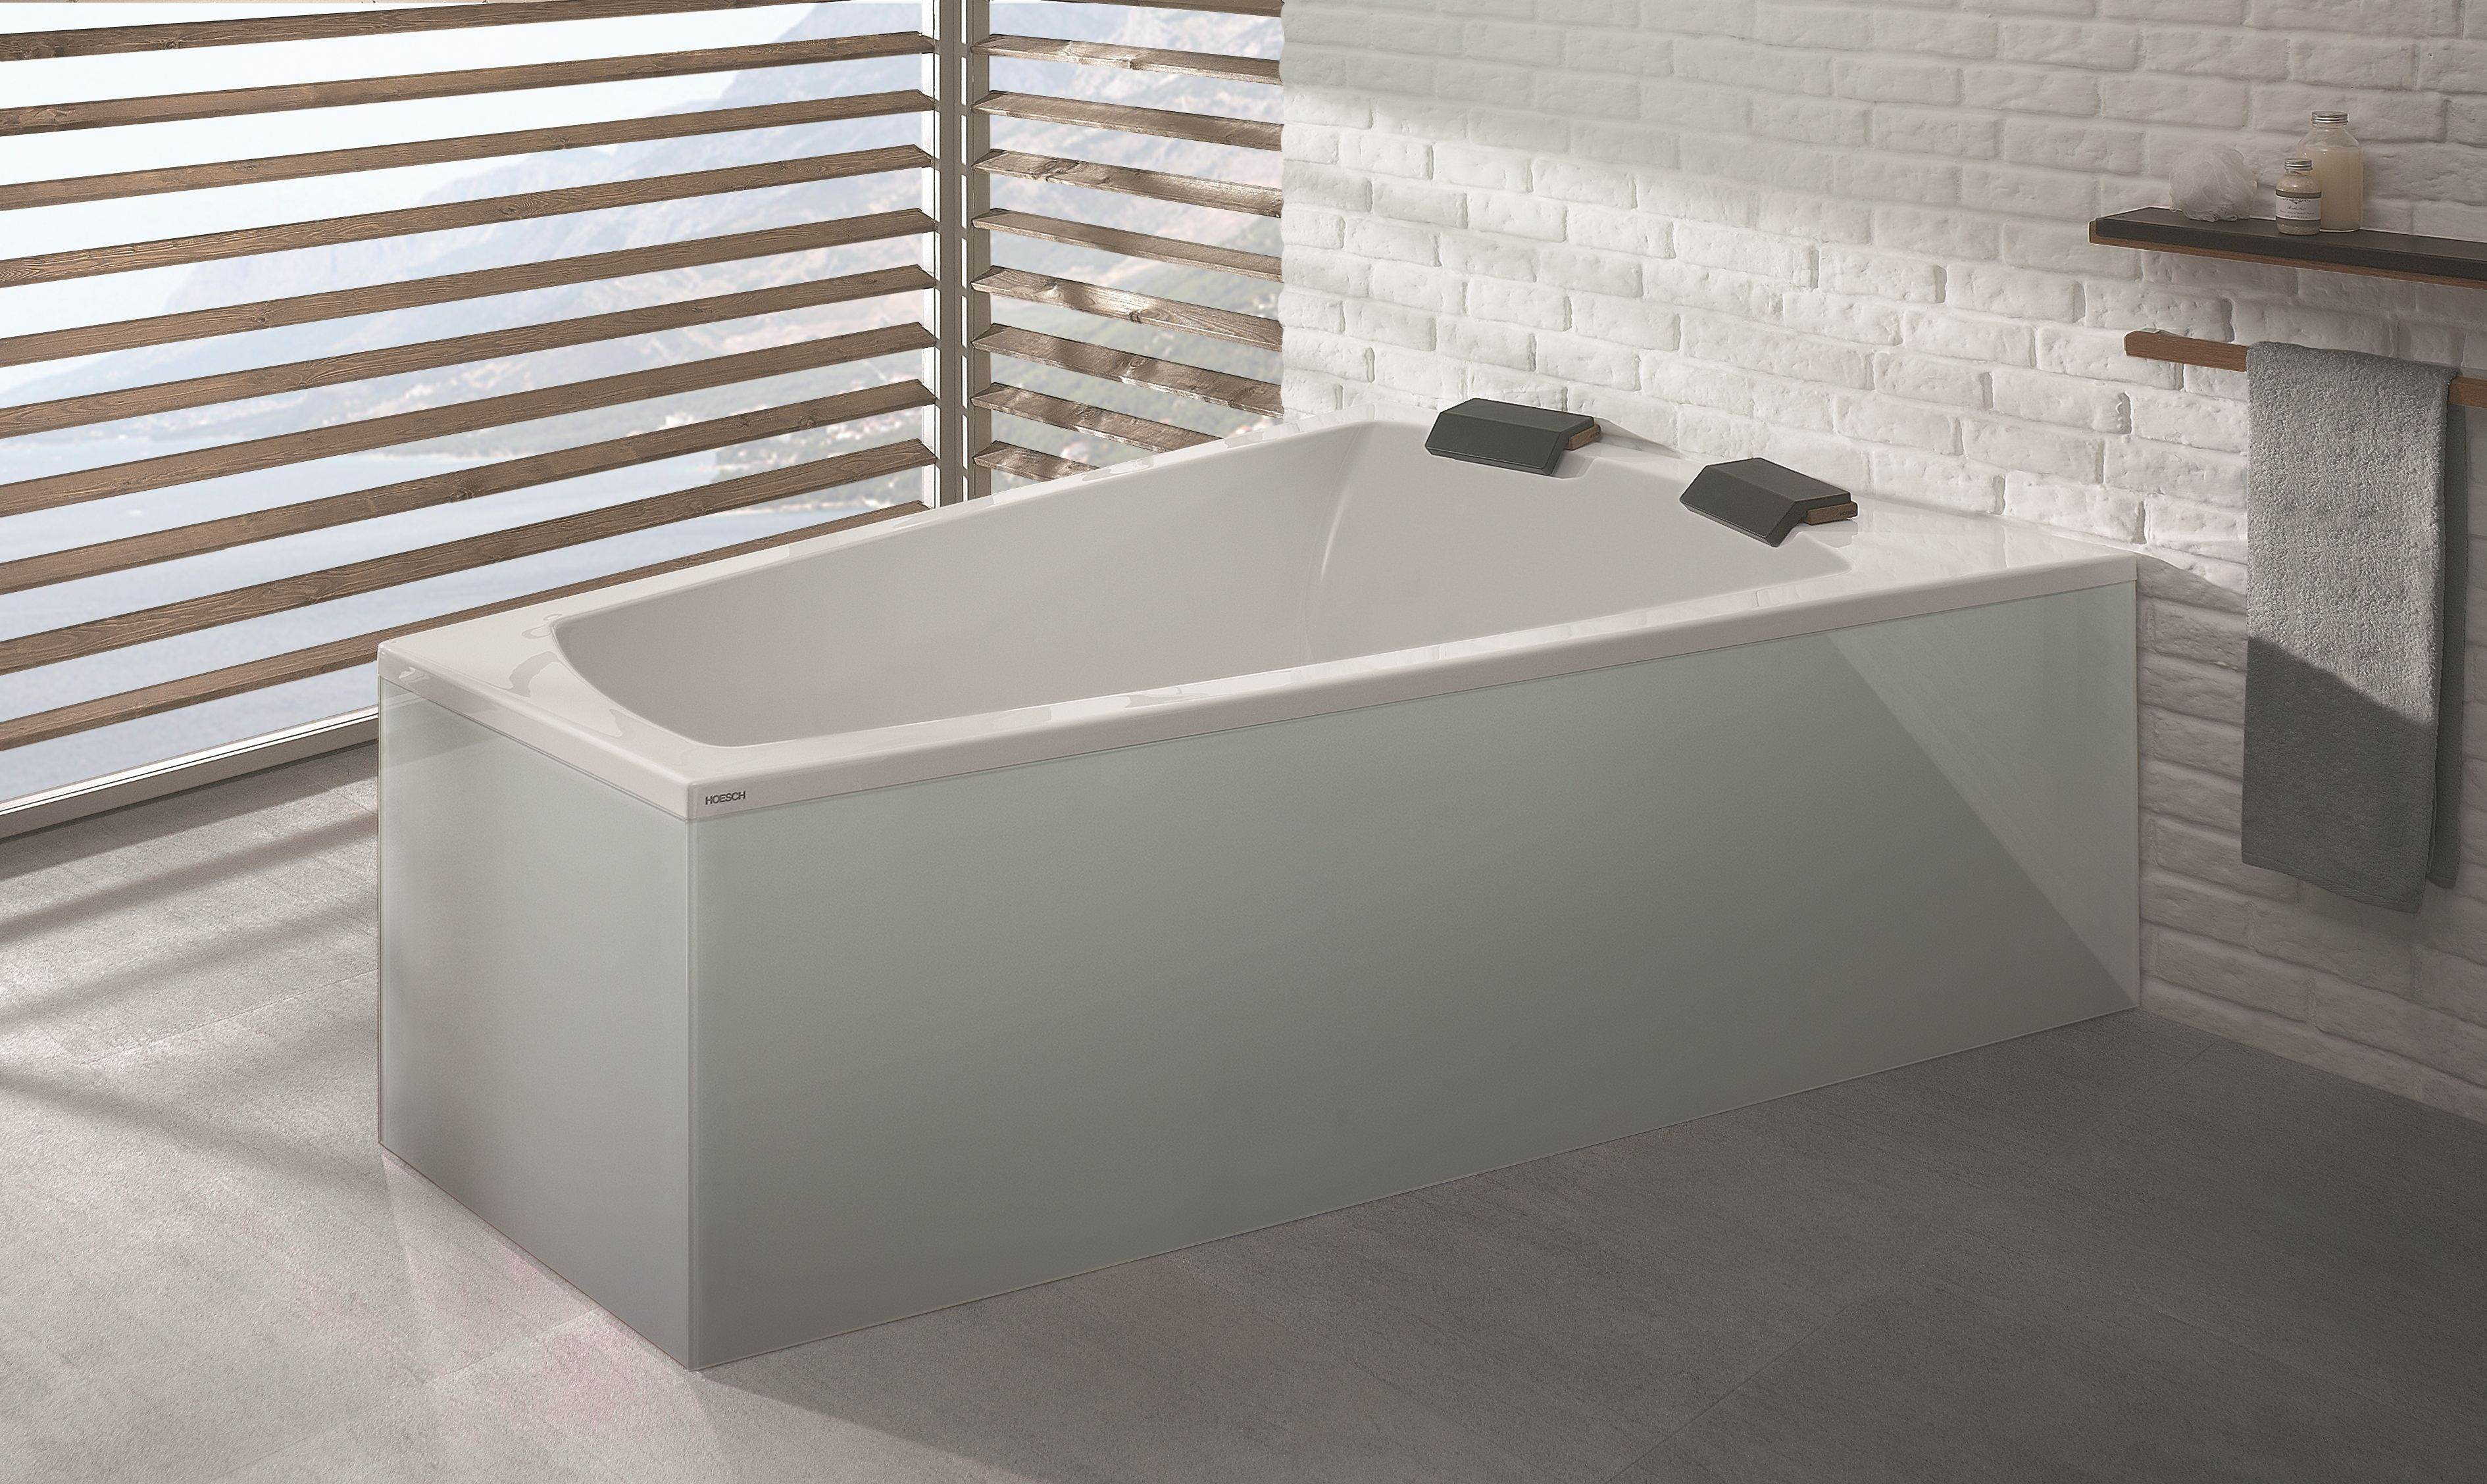 hoesch largo trapezbadewanne 1800 x 1400 mm rechts wei. Black Bedroom Furniture Sets. Home Design Ideas